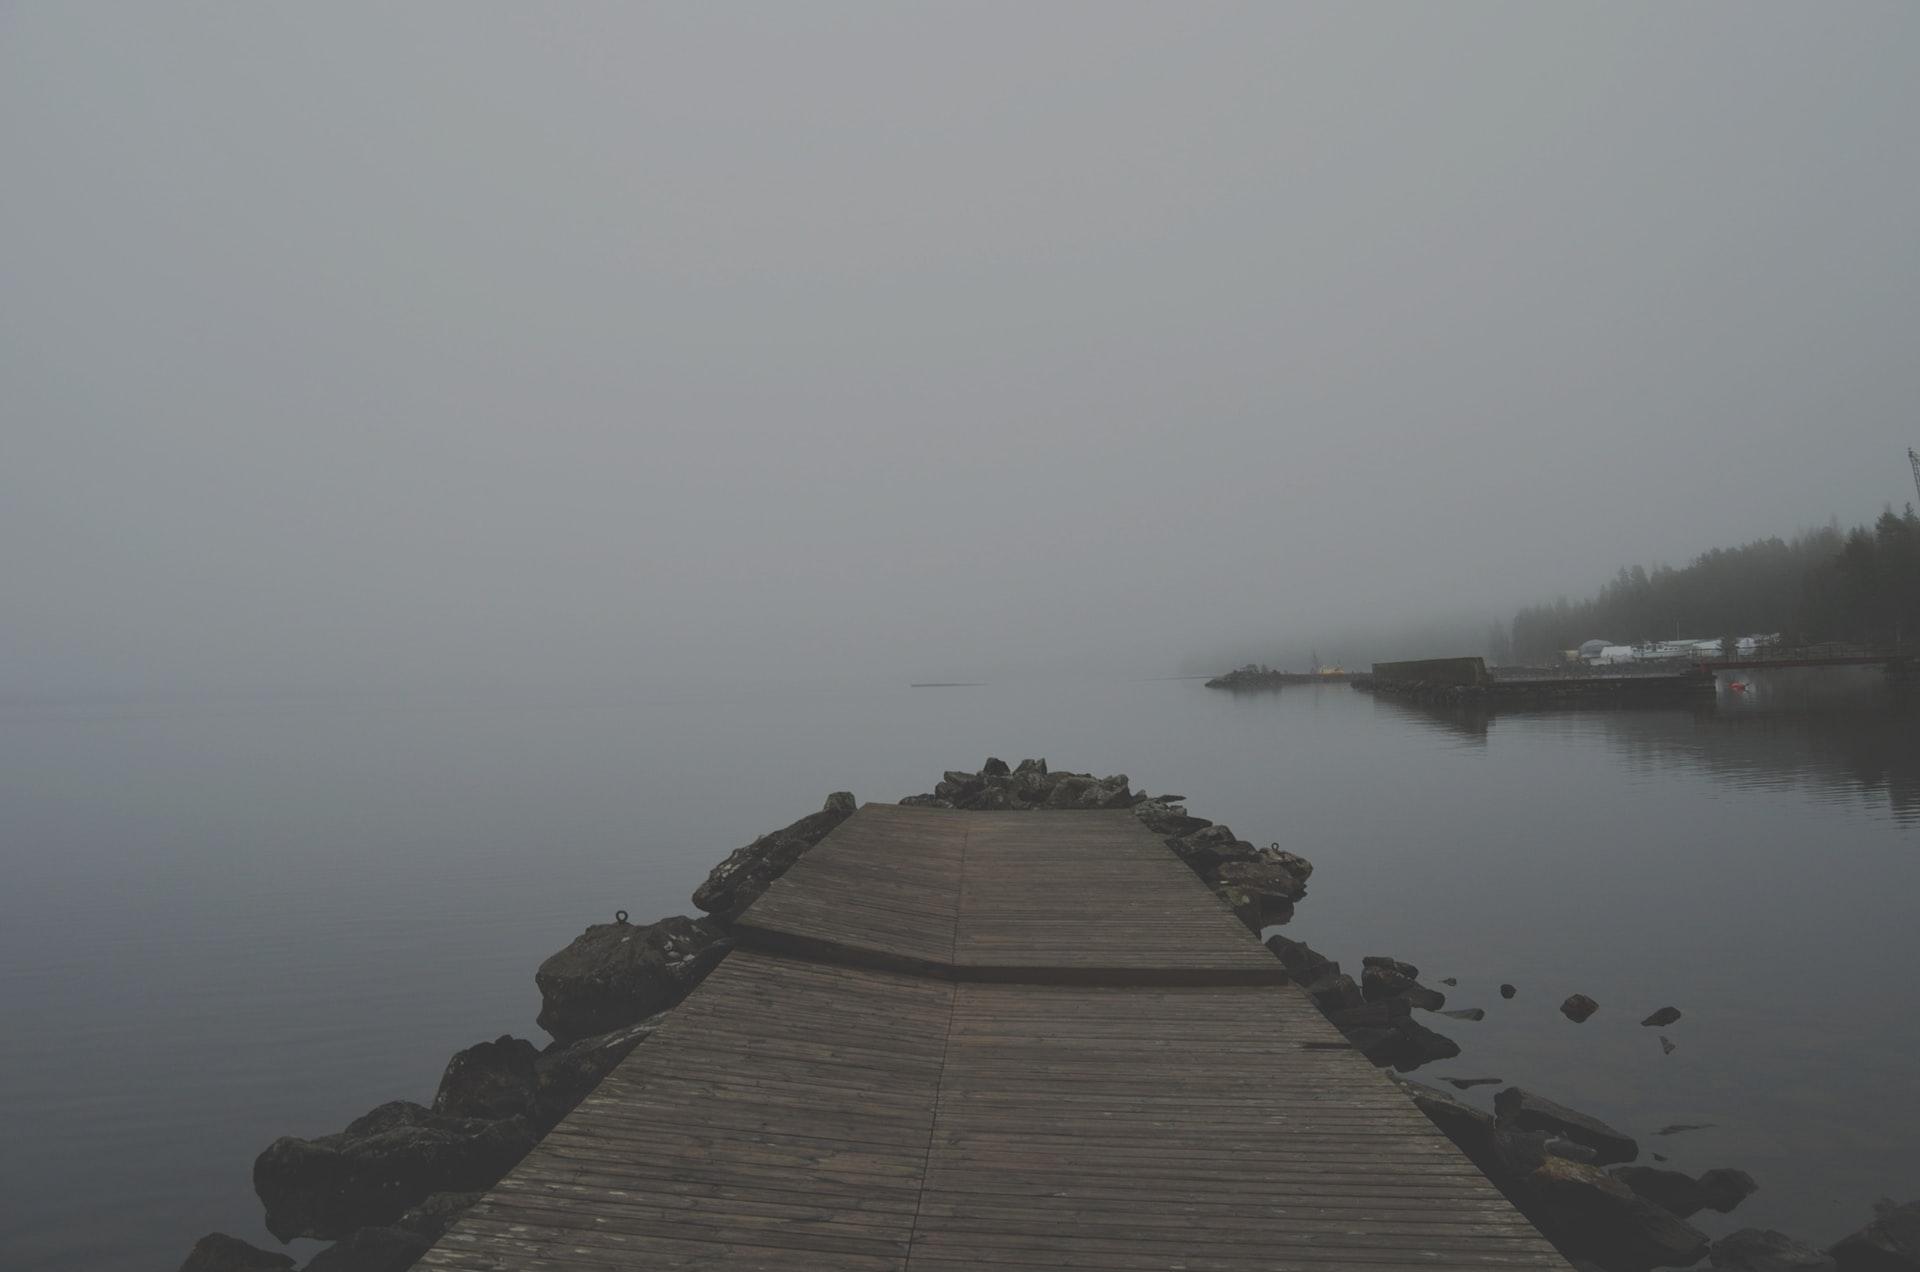 snackenglish, haze, bruma, calima, neblina, water, night, gray